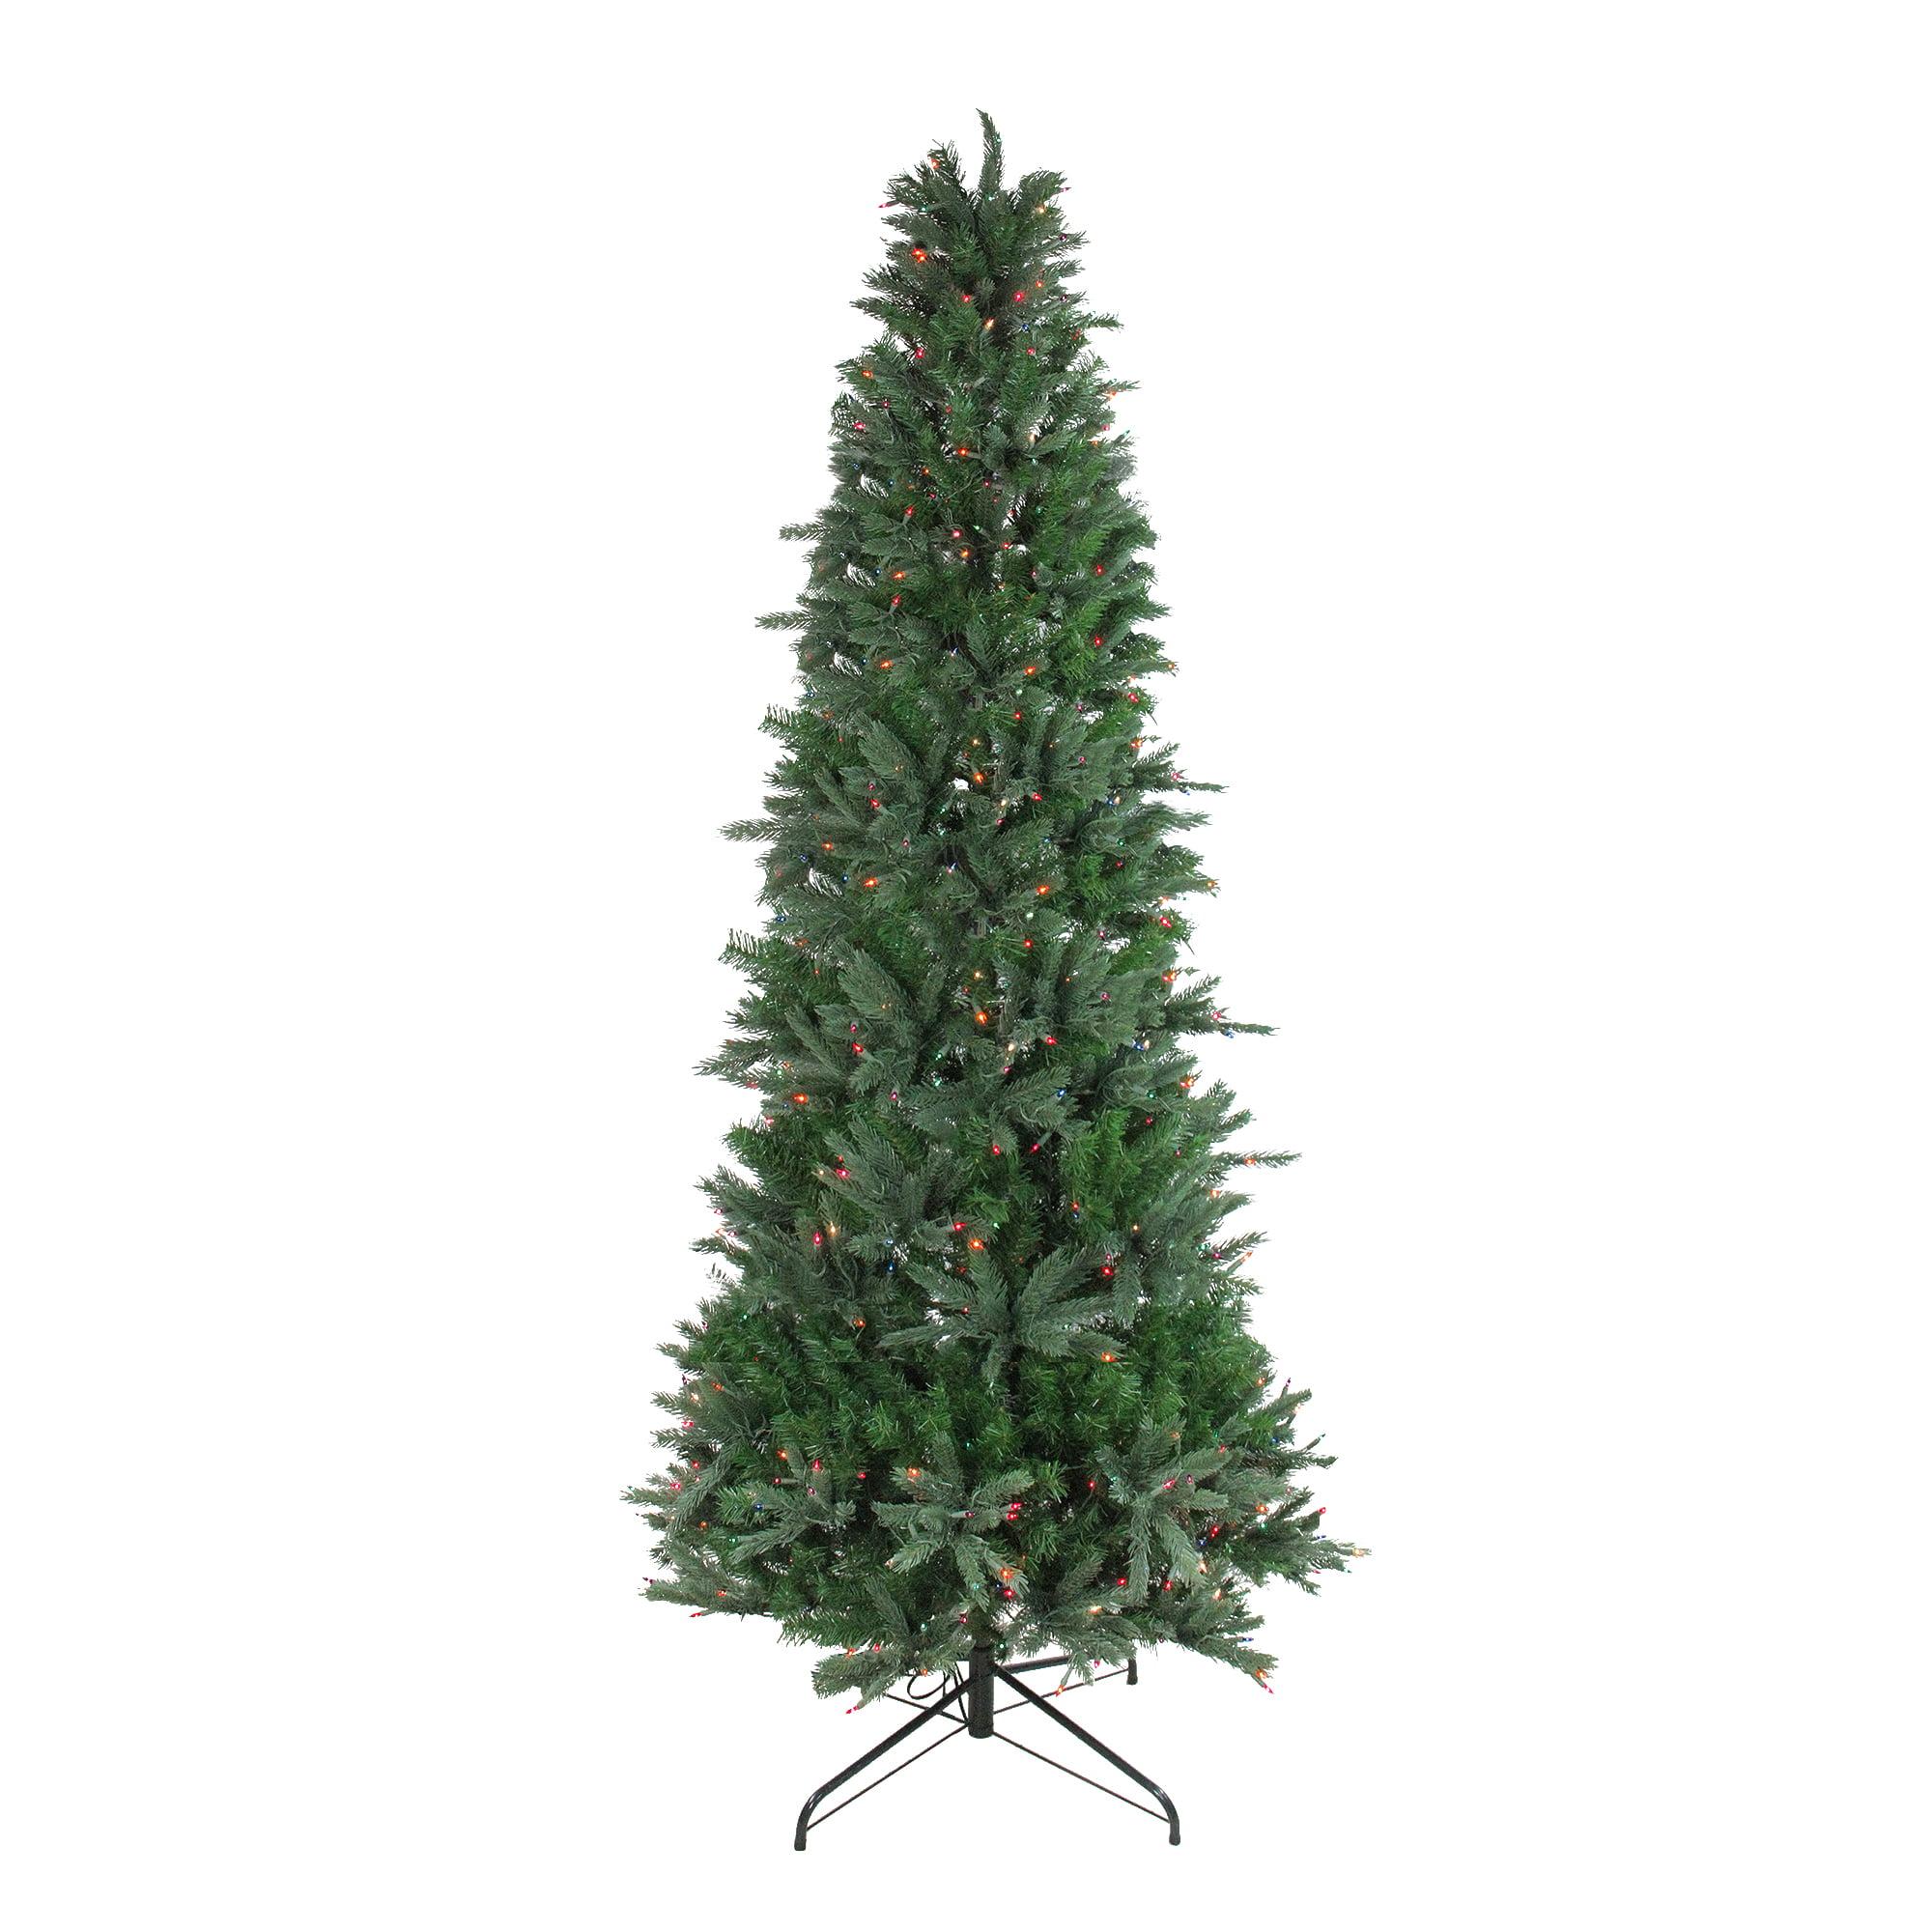 Multi Color Pre Lit Christmas Trees: Vickerman 9.5' Pre-Lit Artificial Christmas Tree Slim